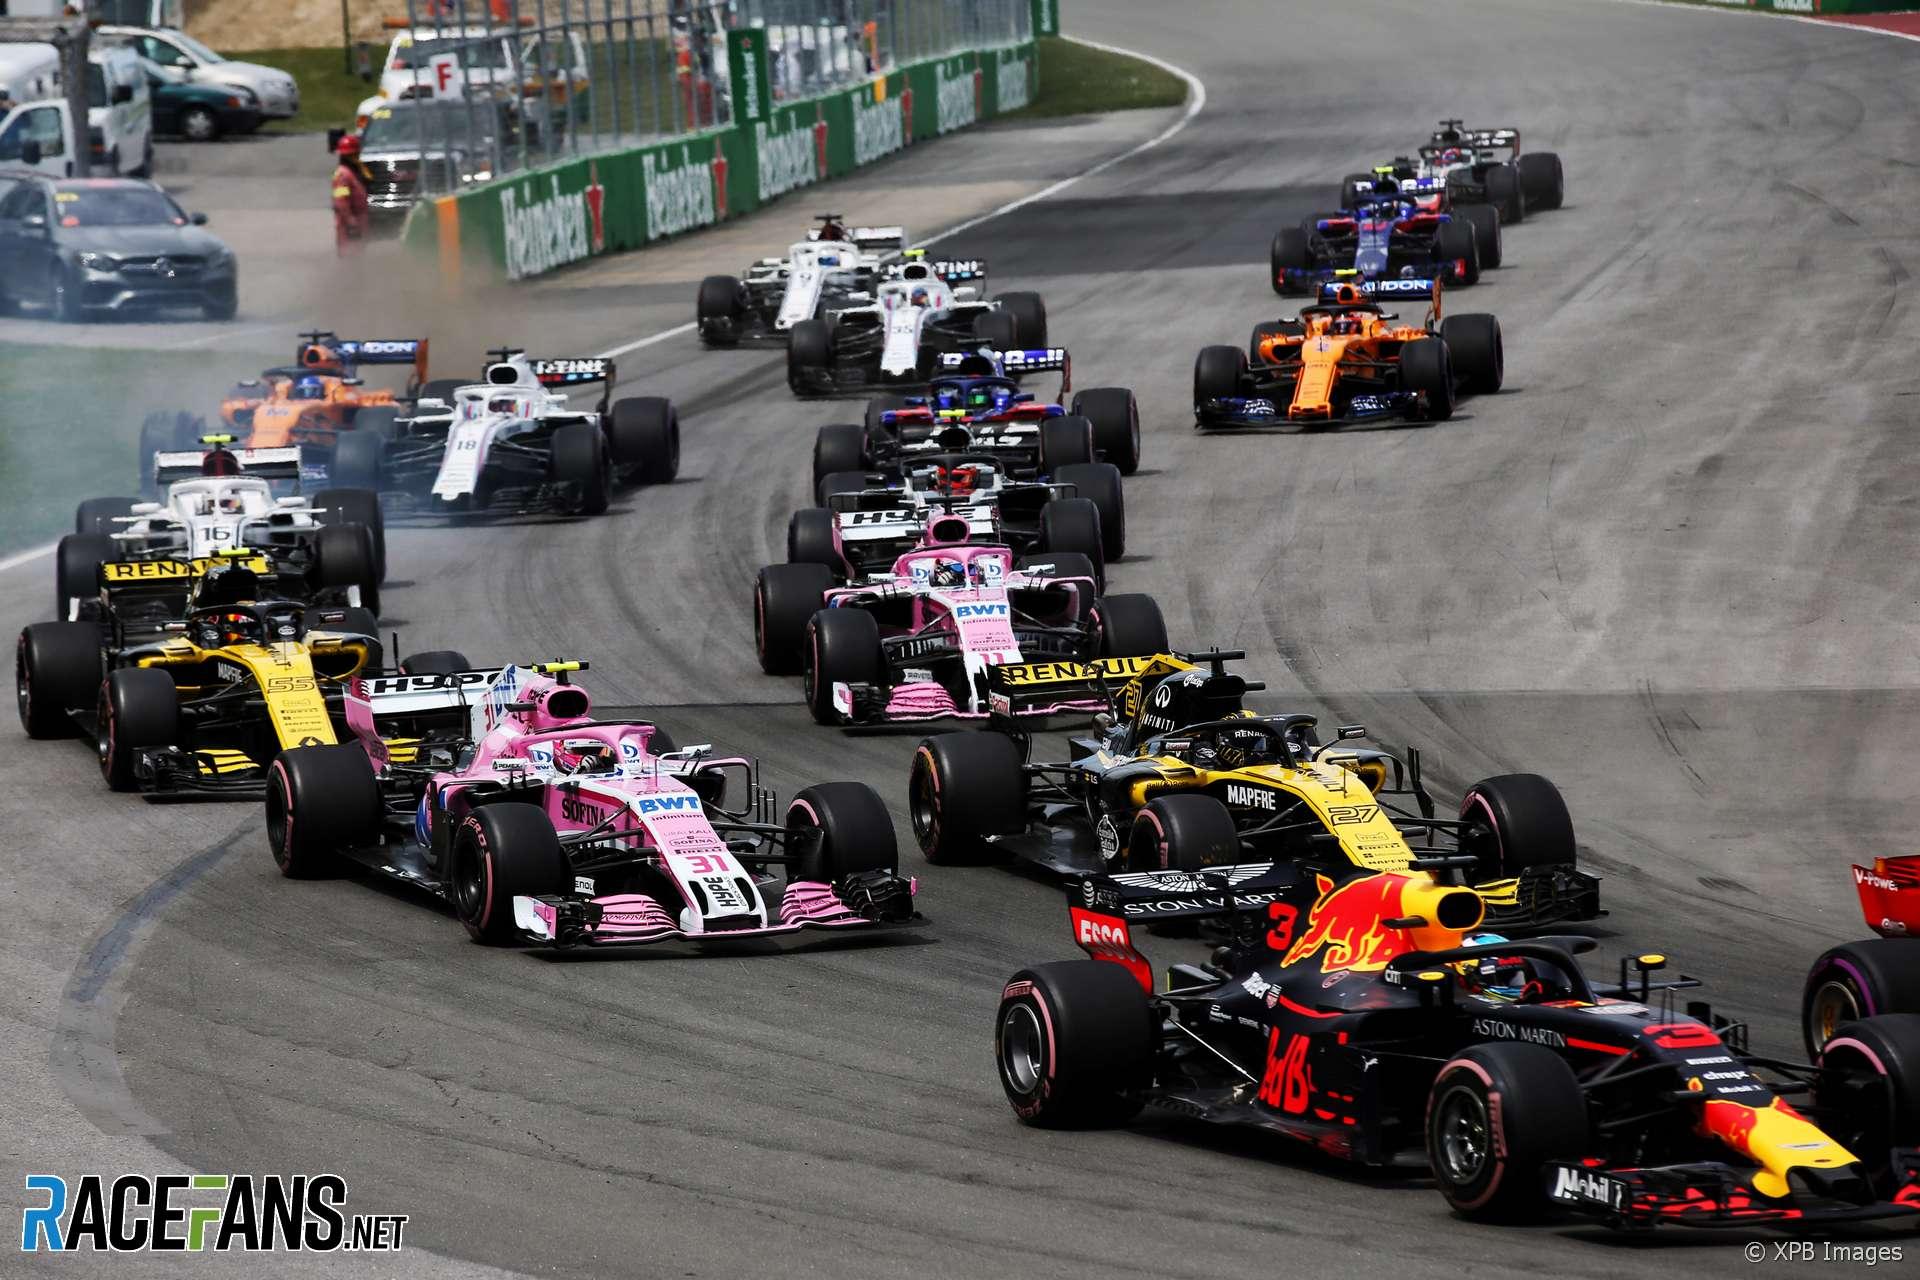 Start, Circuit Gilles Villeneuve, 2018